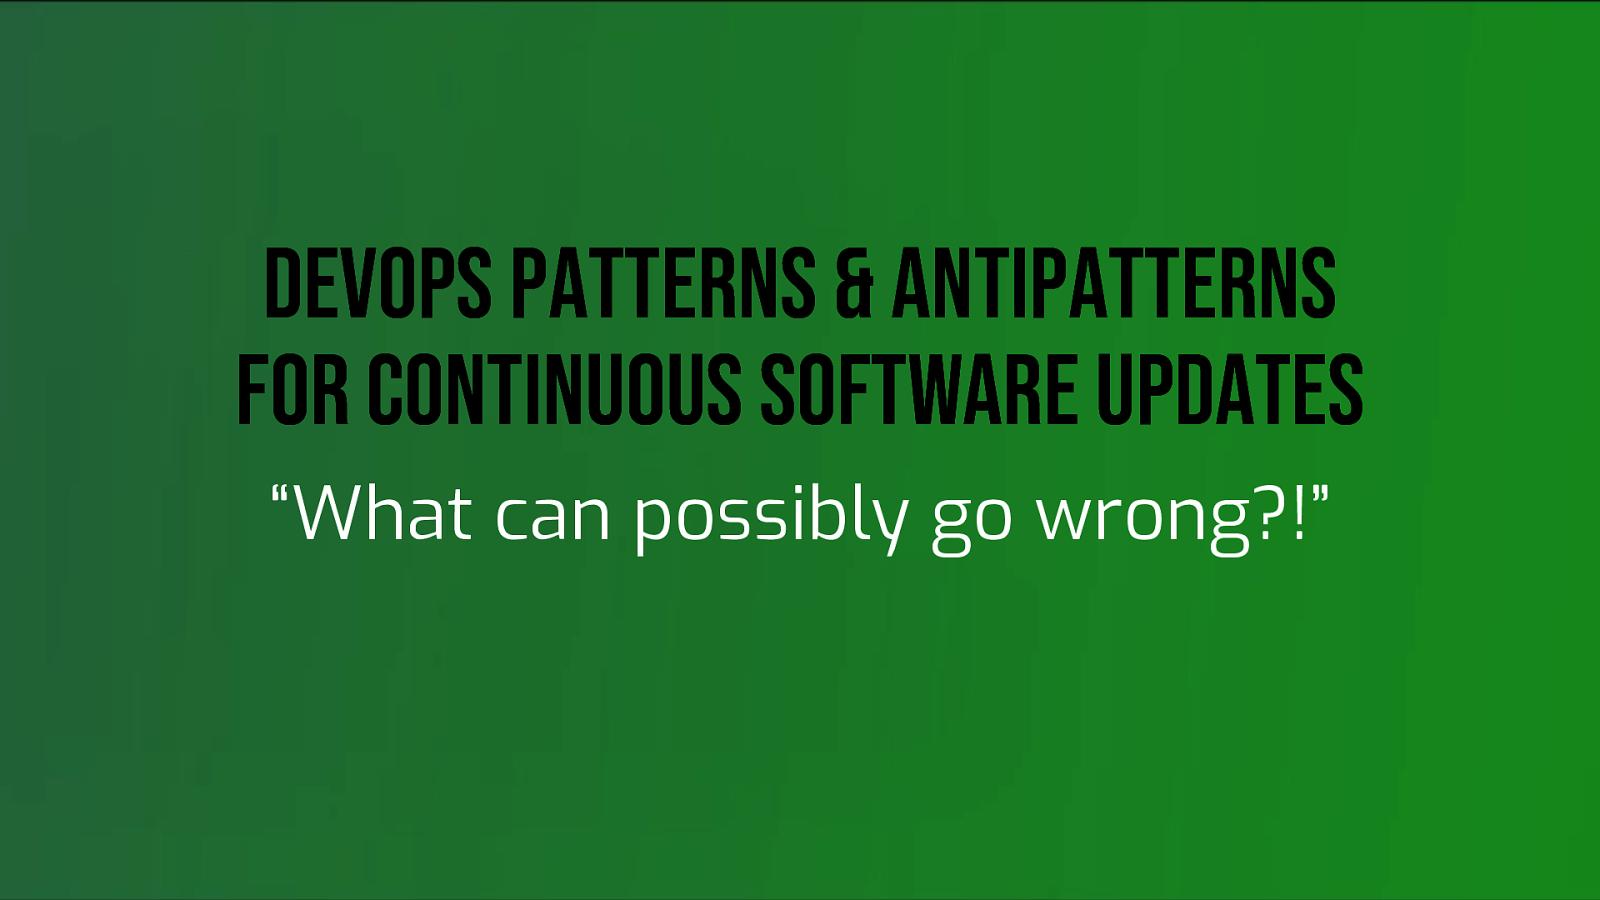 DevOps Patterns & Antipatterns for Continuous Software Updates by Baruch Sadogursky